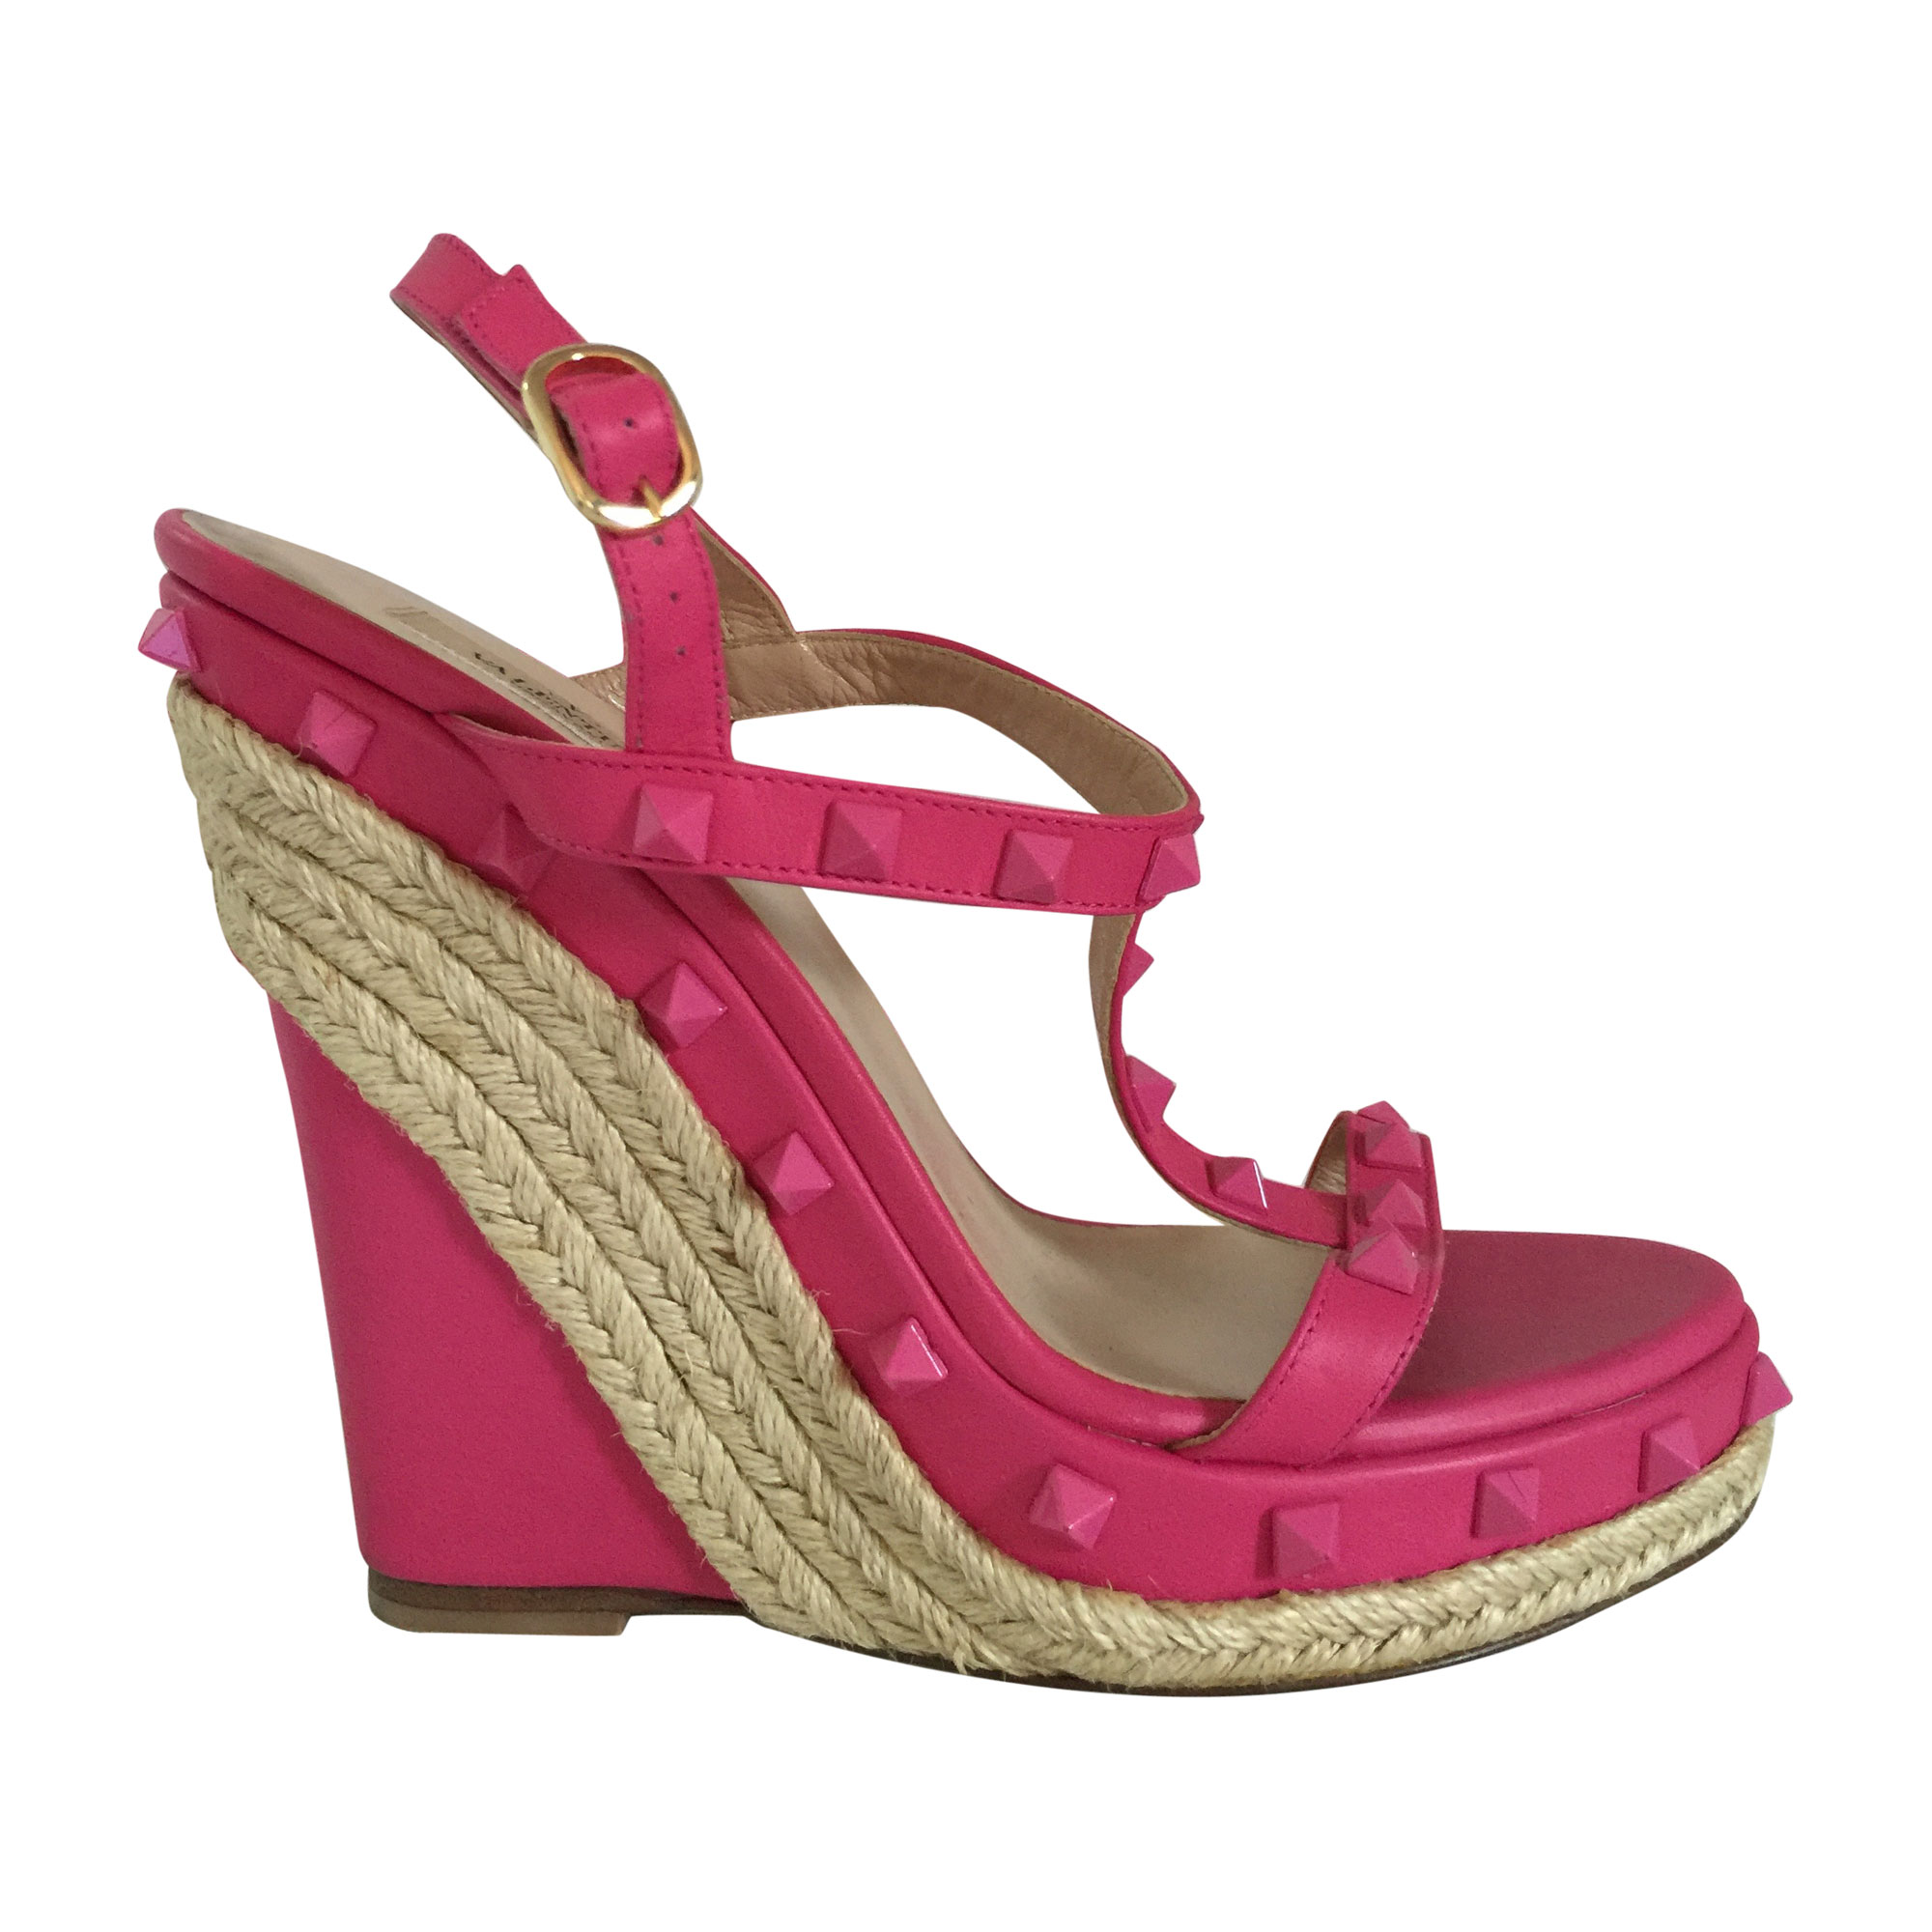 38 Compensées 5190978 Rose Valentino Sandales mNn0vPy8wO